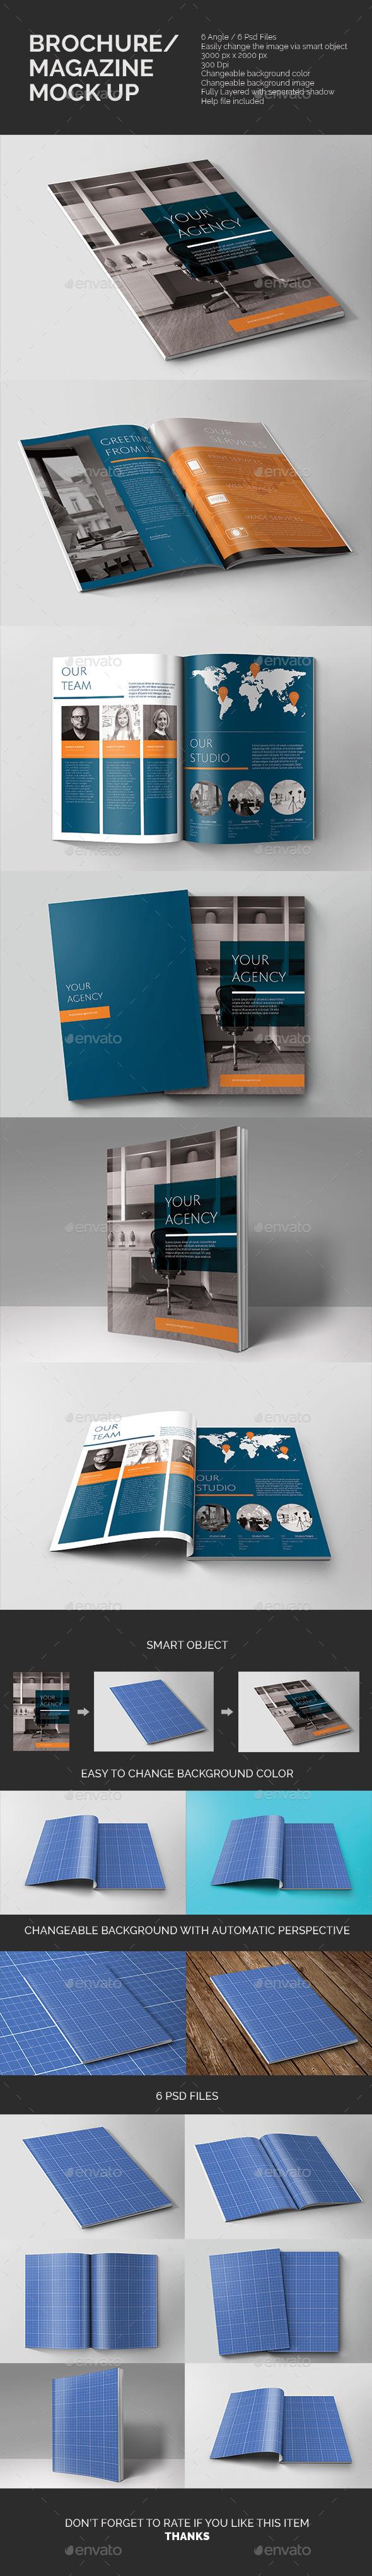 GraphicRiver Brochure Magazine Mock-up 10375844